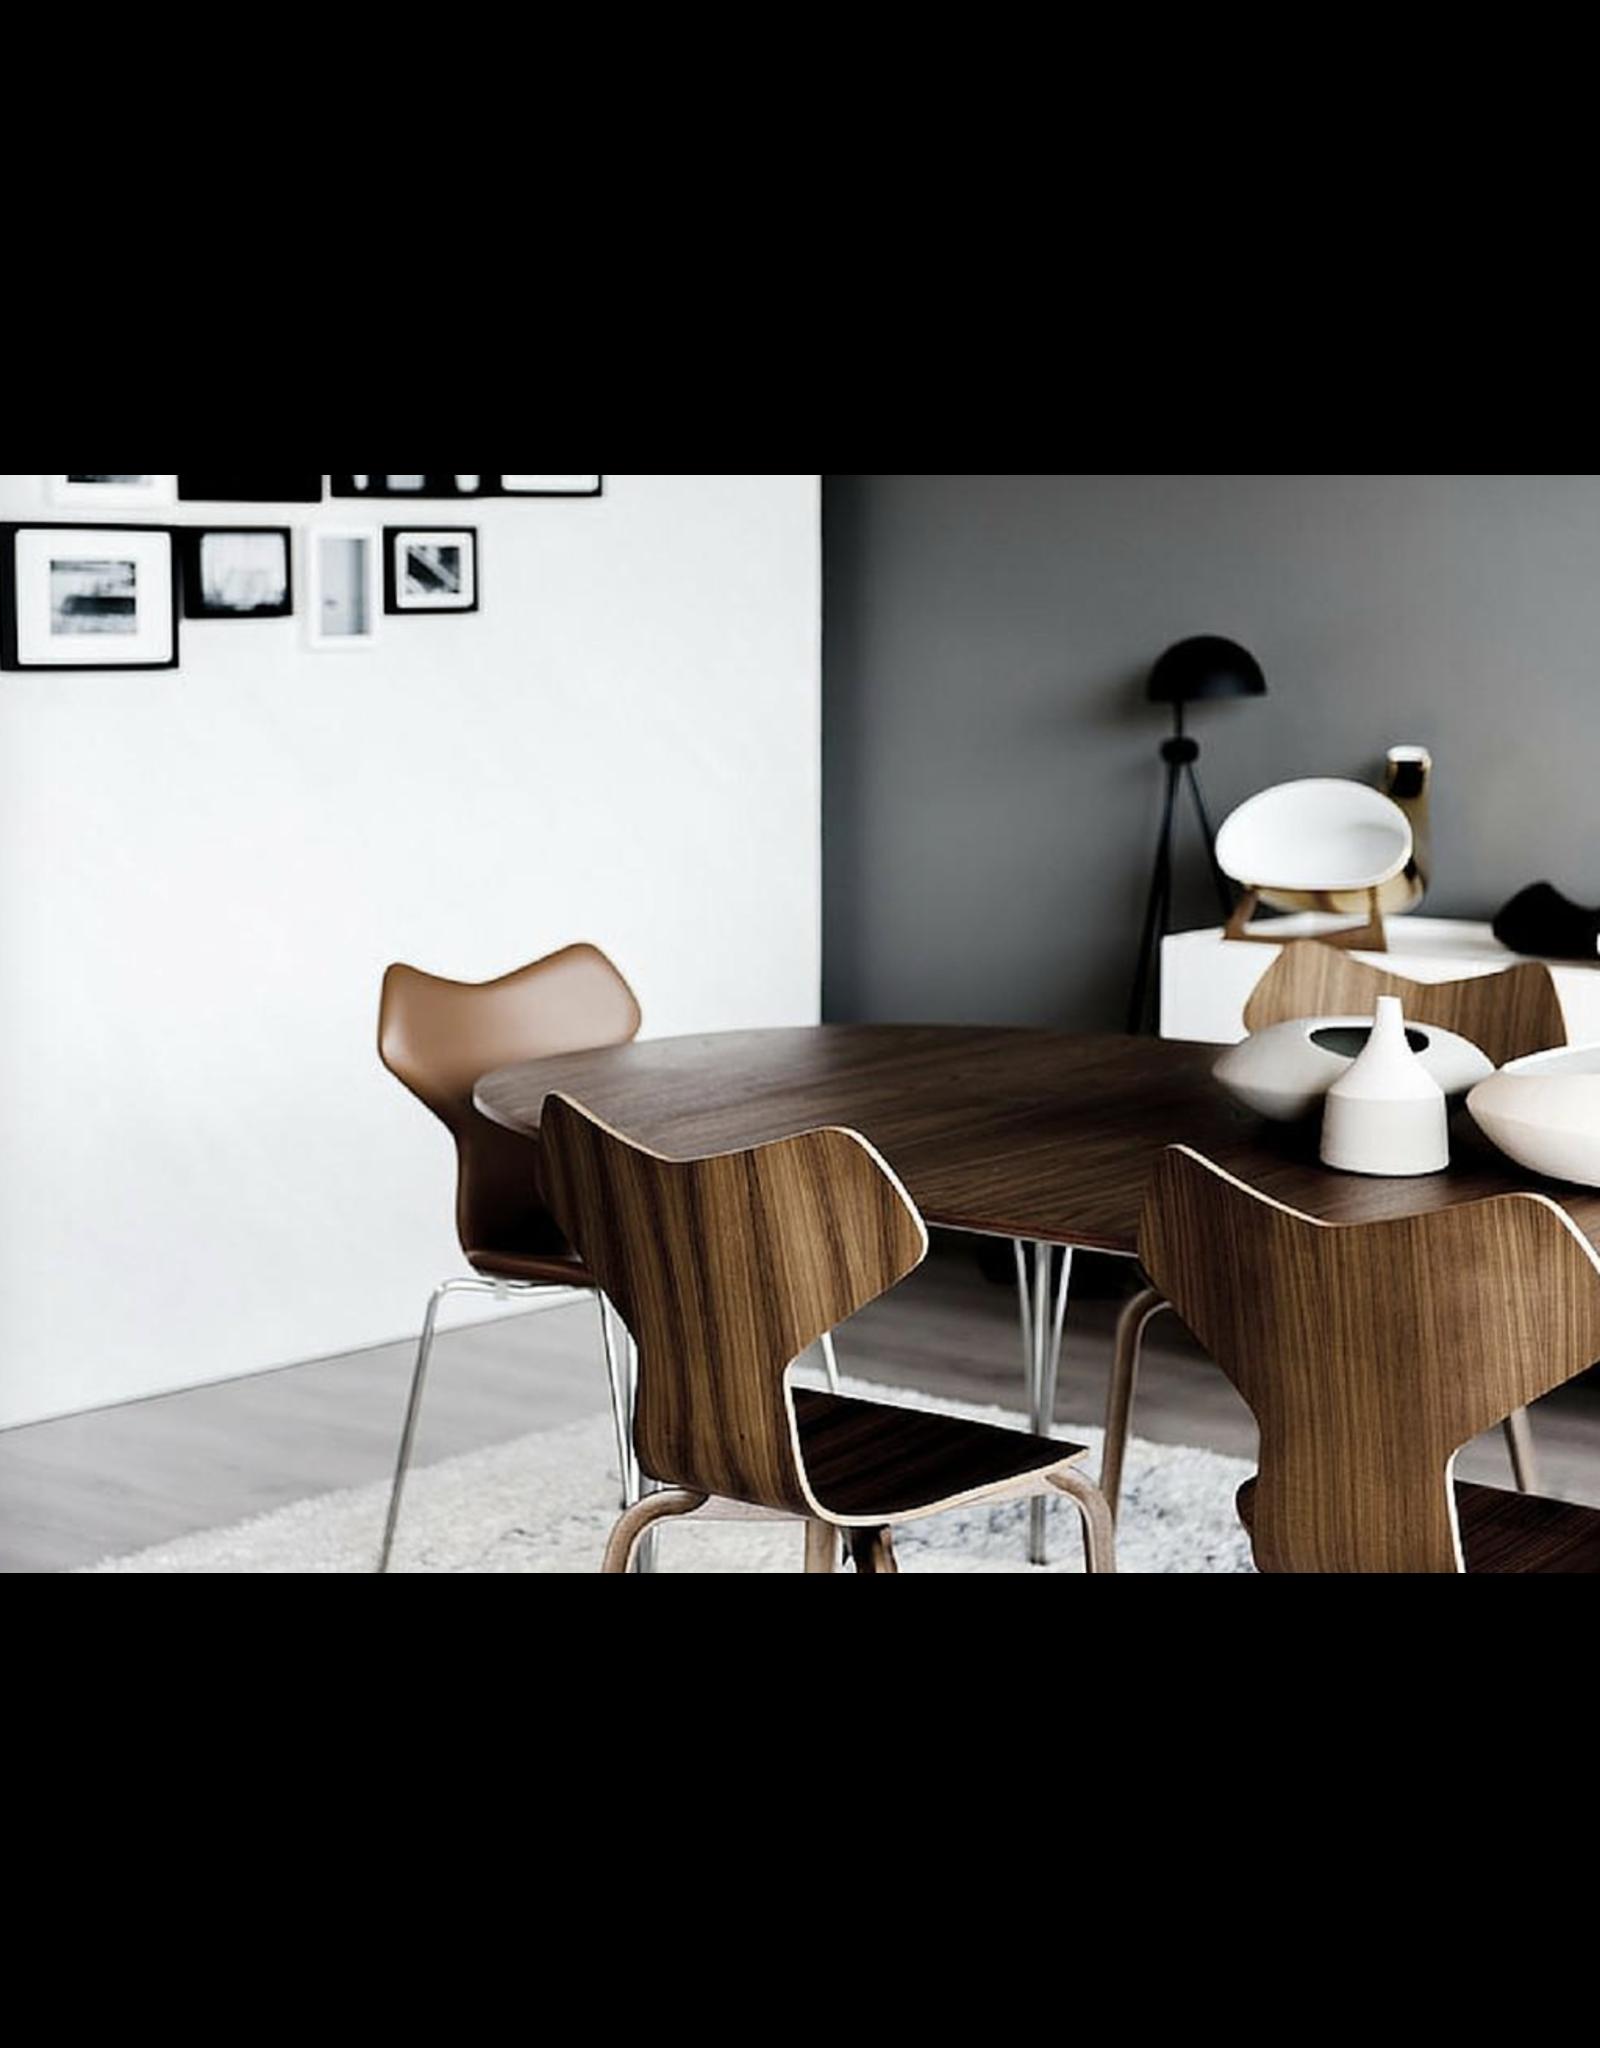 FRITZ HANSEN B614 SUPER-ELLIPTICAL TABLE IN WALNUT